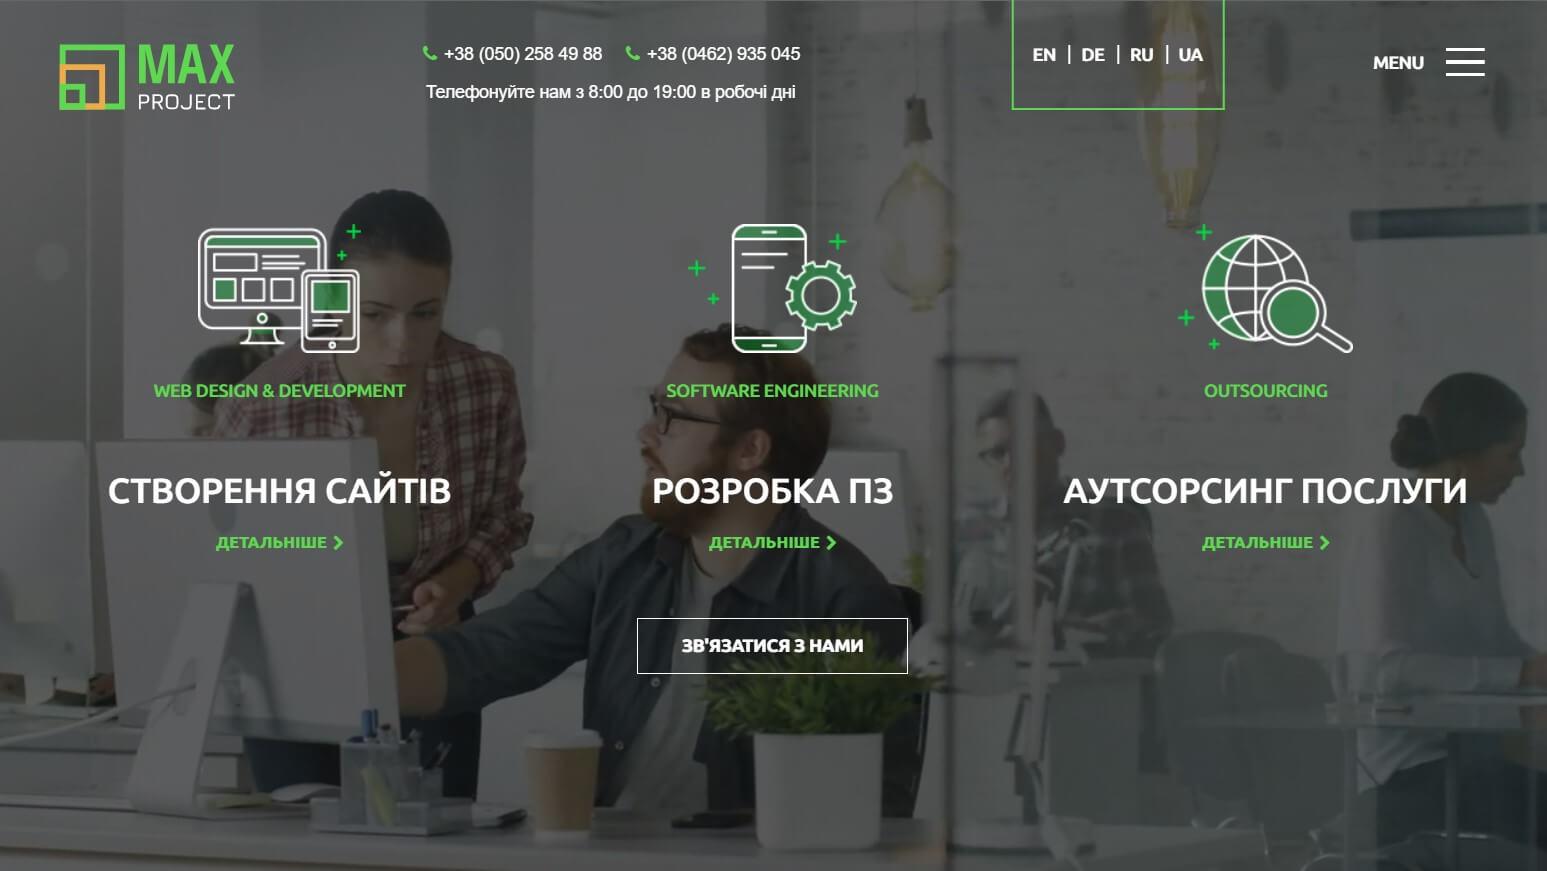 Max Project - обзор компании, услуги, отзывы, клиенты, Фото № 1 - google-seo.pro